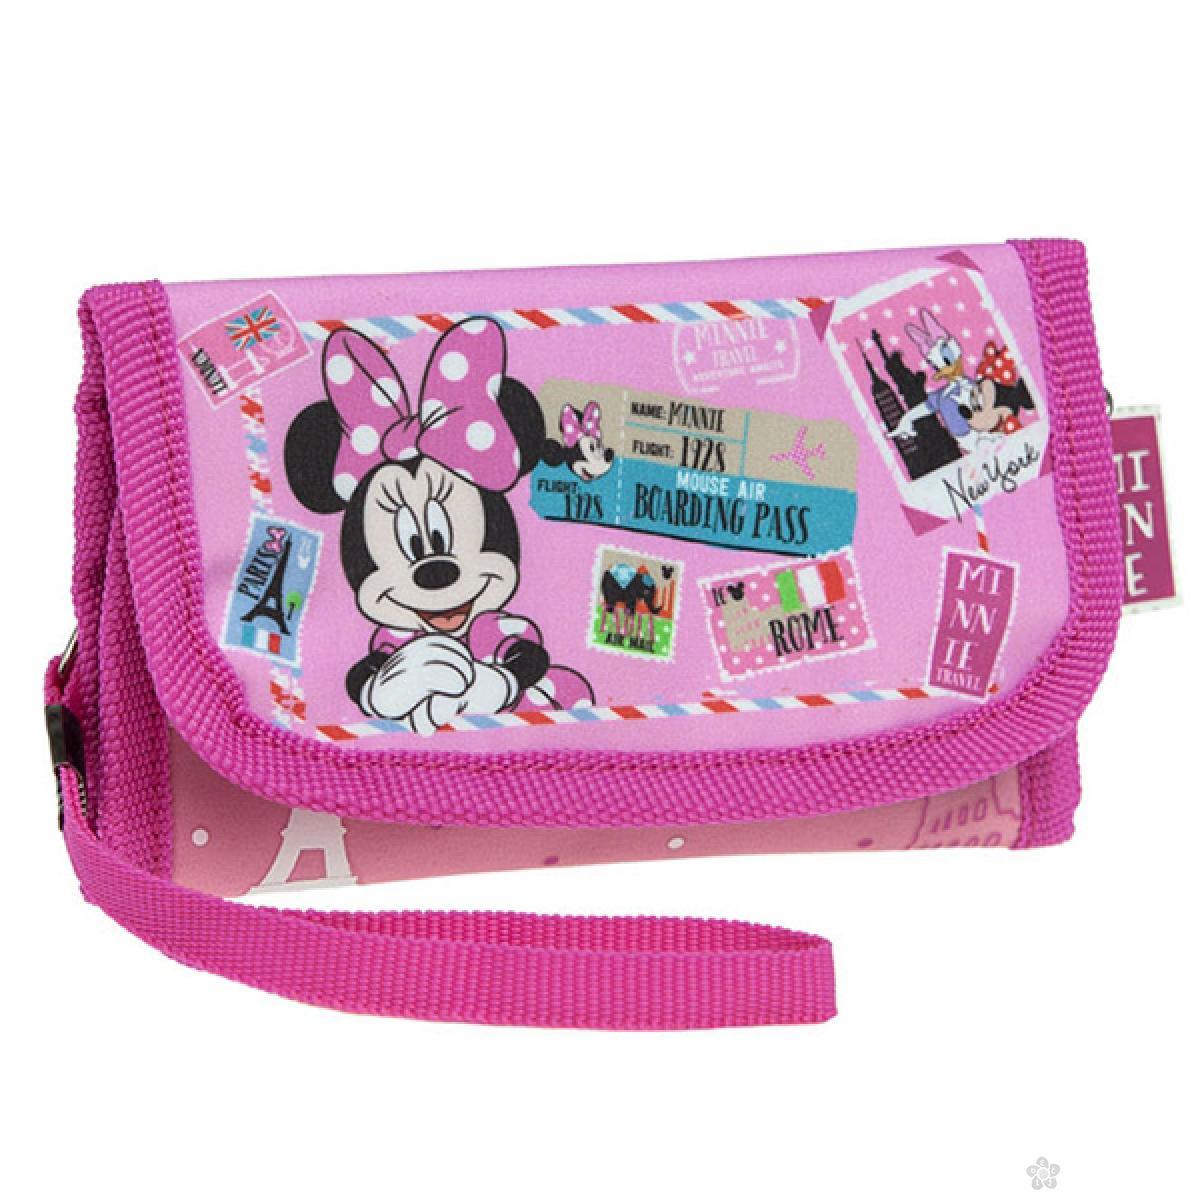 Novčanik Minnie & Daisy 40.781.51